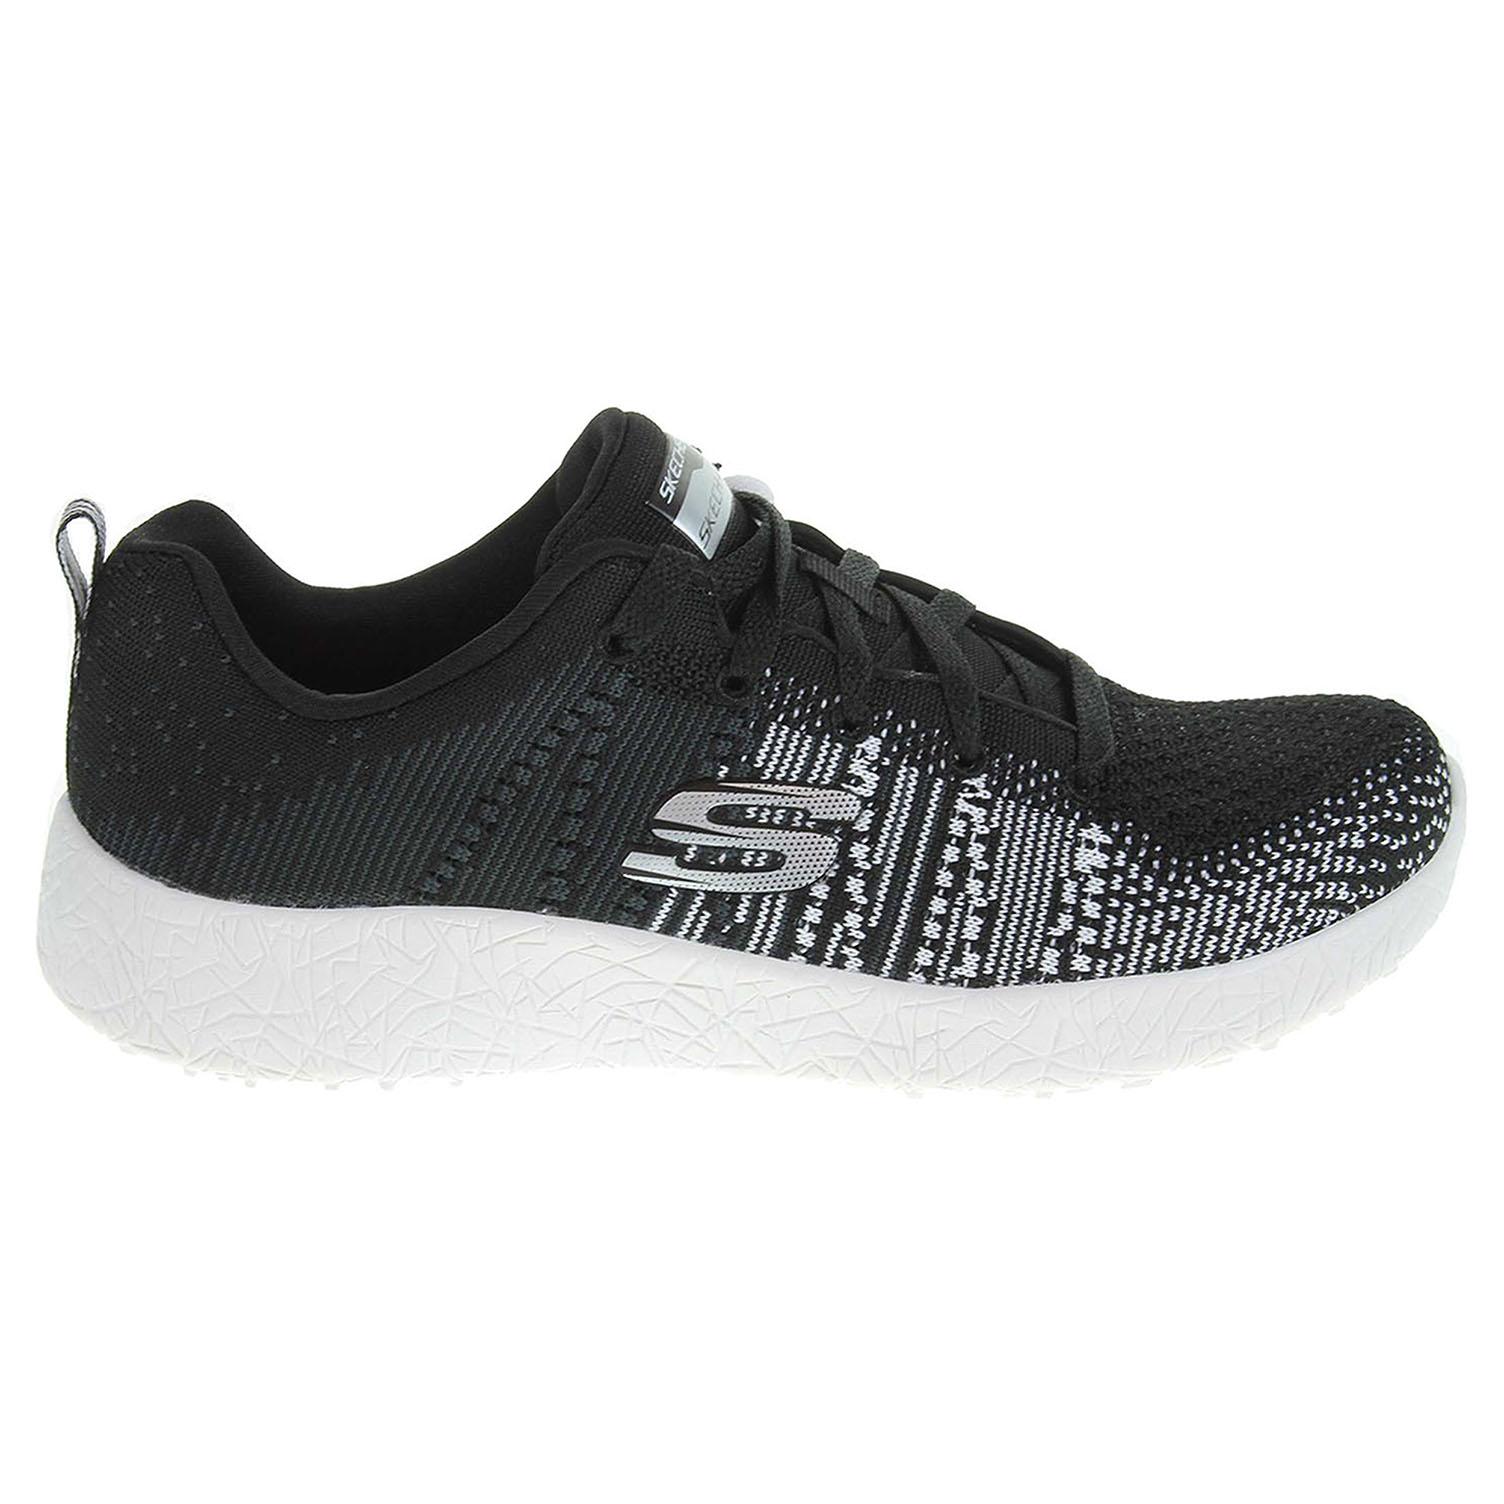 Skechers Burst Ellipse black-white  963947f396